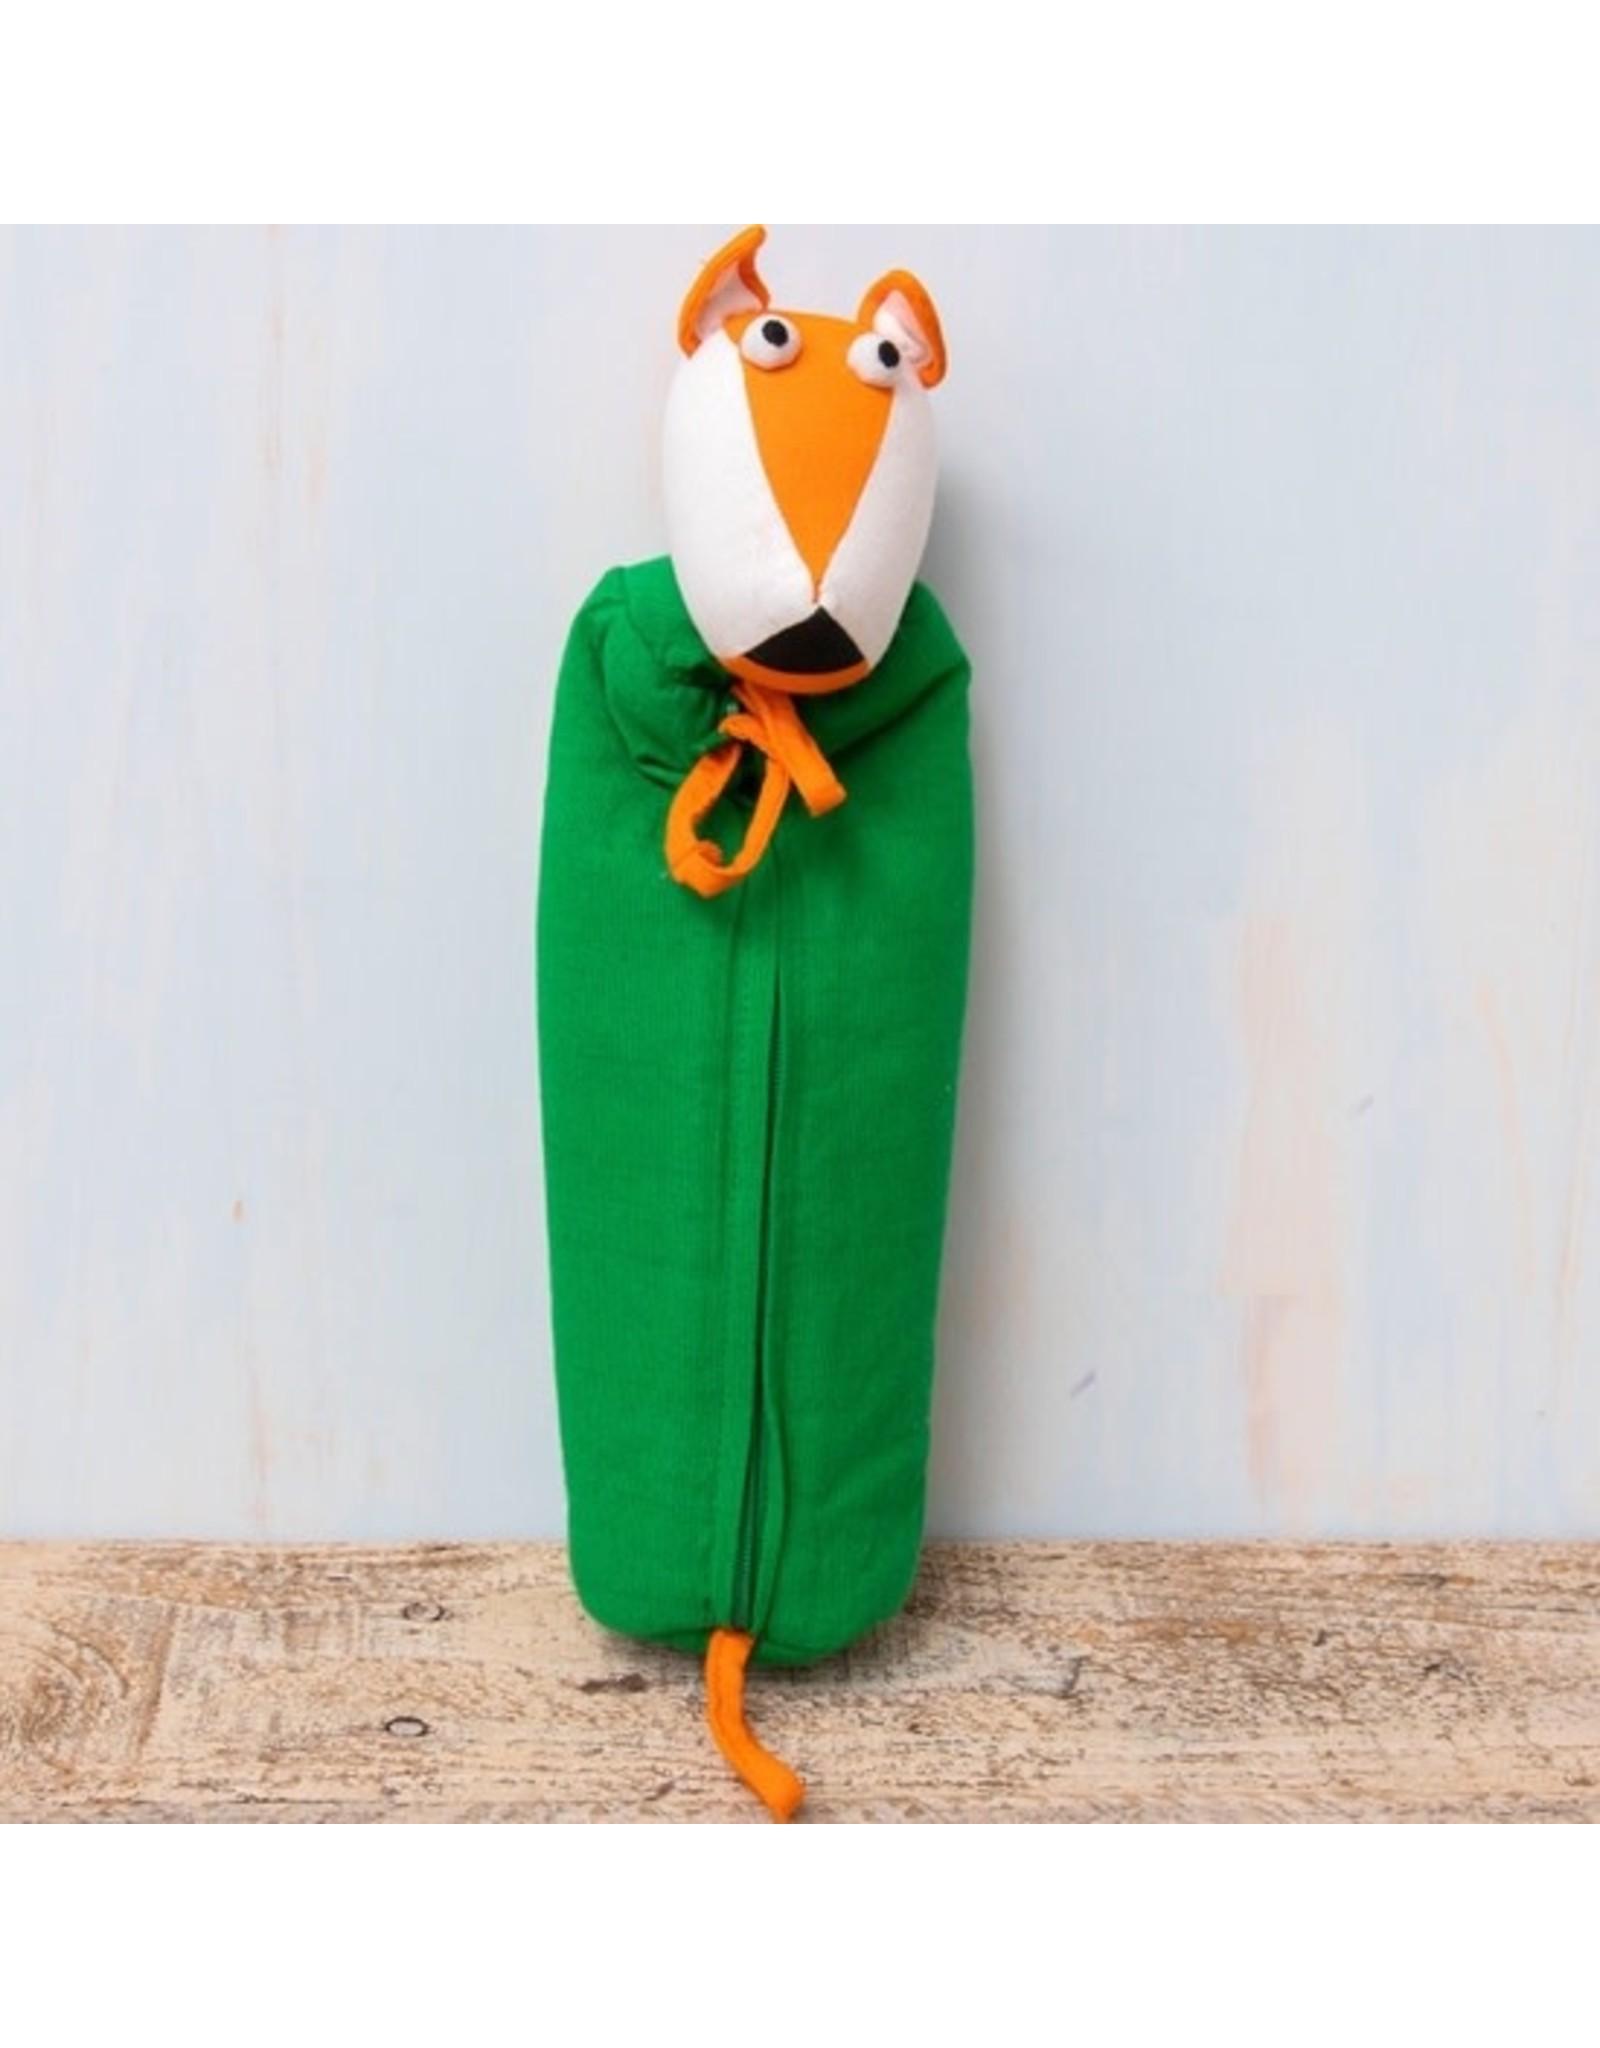 Mr. Ellie Pooh Pencil Case Fox, Sri Lanka